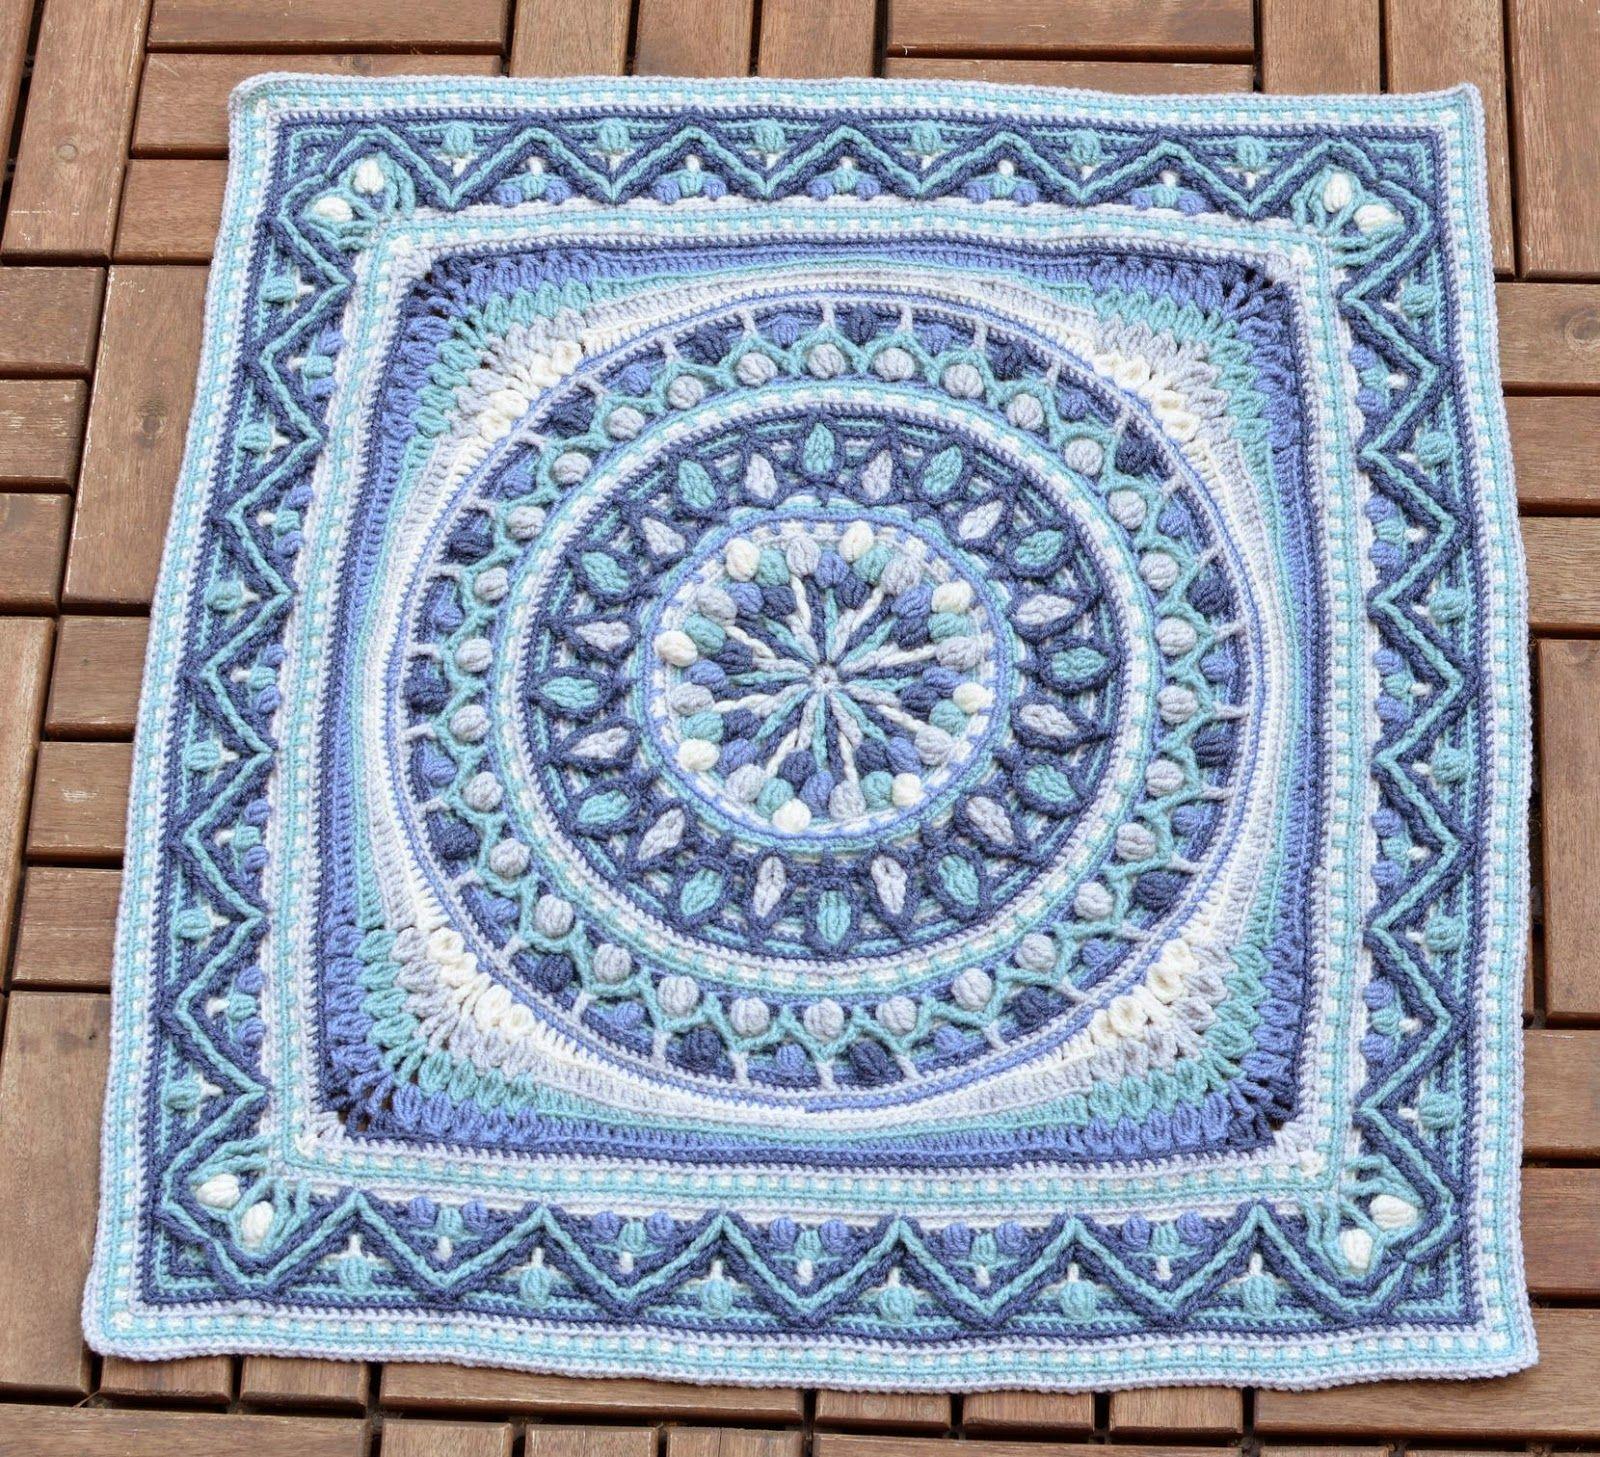 Dsc 0383a Jpg 1 600 1 457 Pikseli Wzory Wzory Szydelkowe Szydelkowe Kwadraty